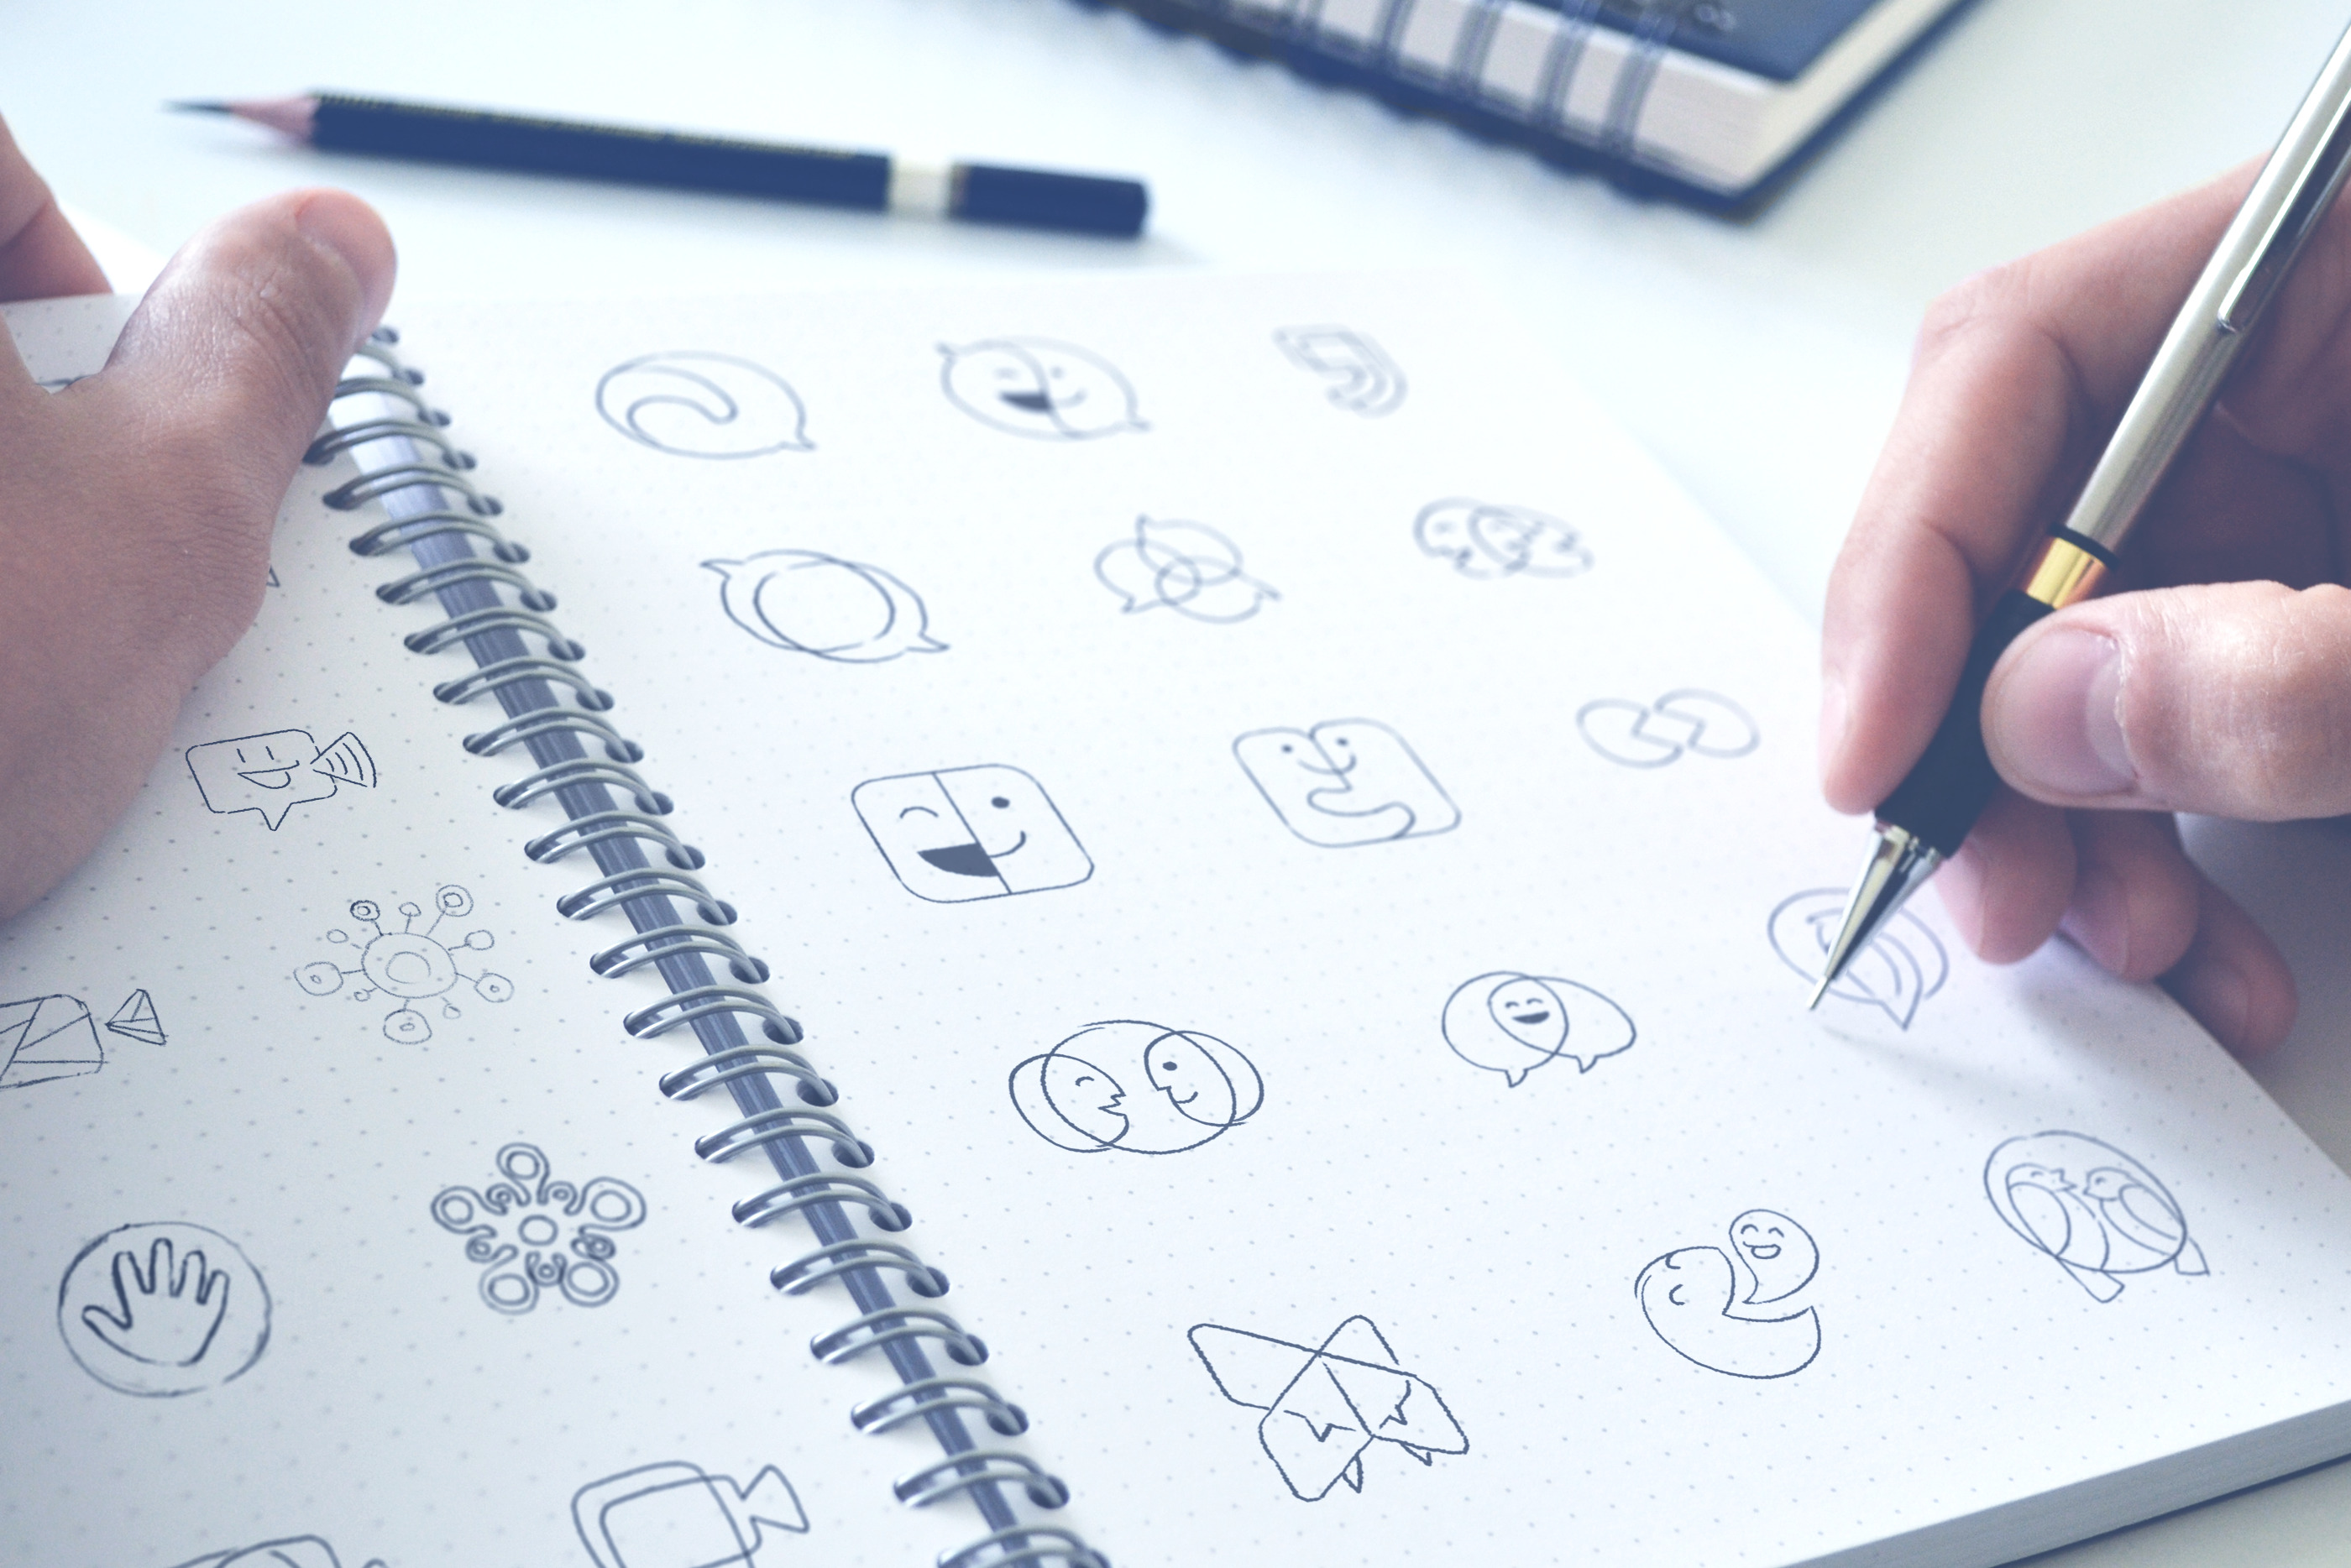 justalk sketches